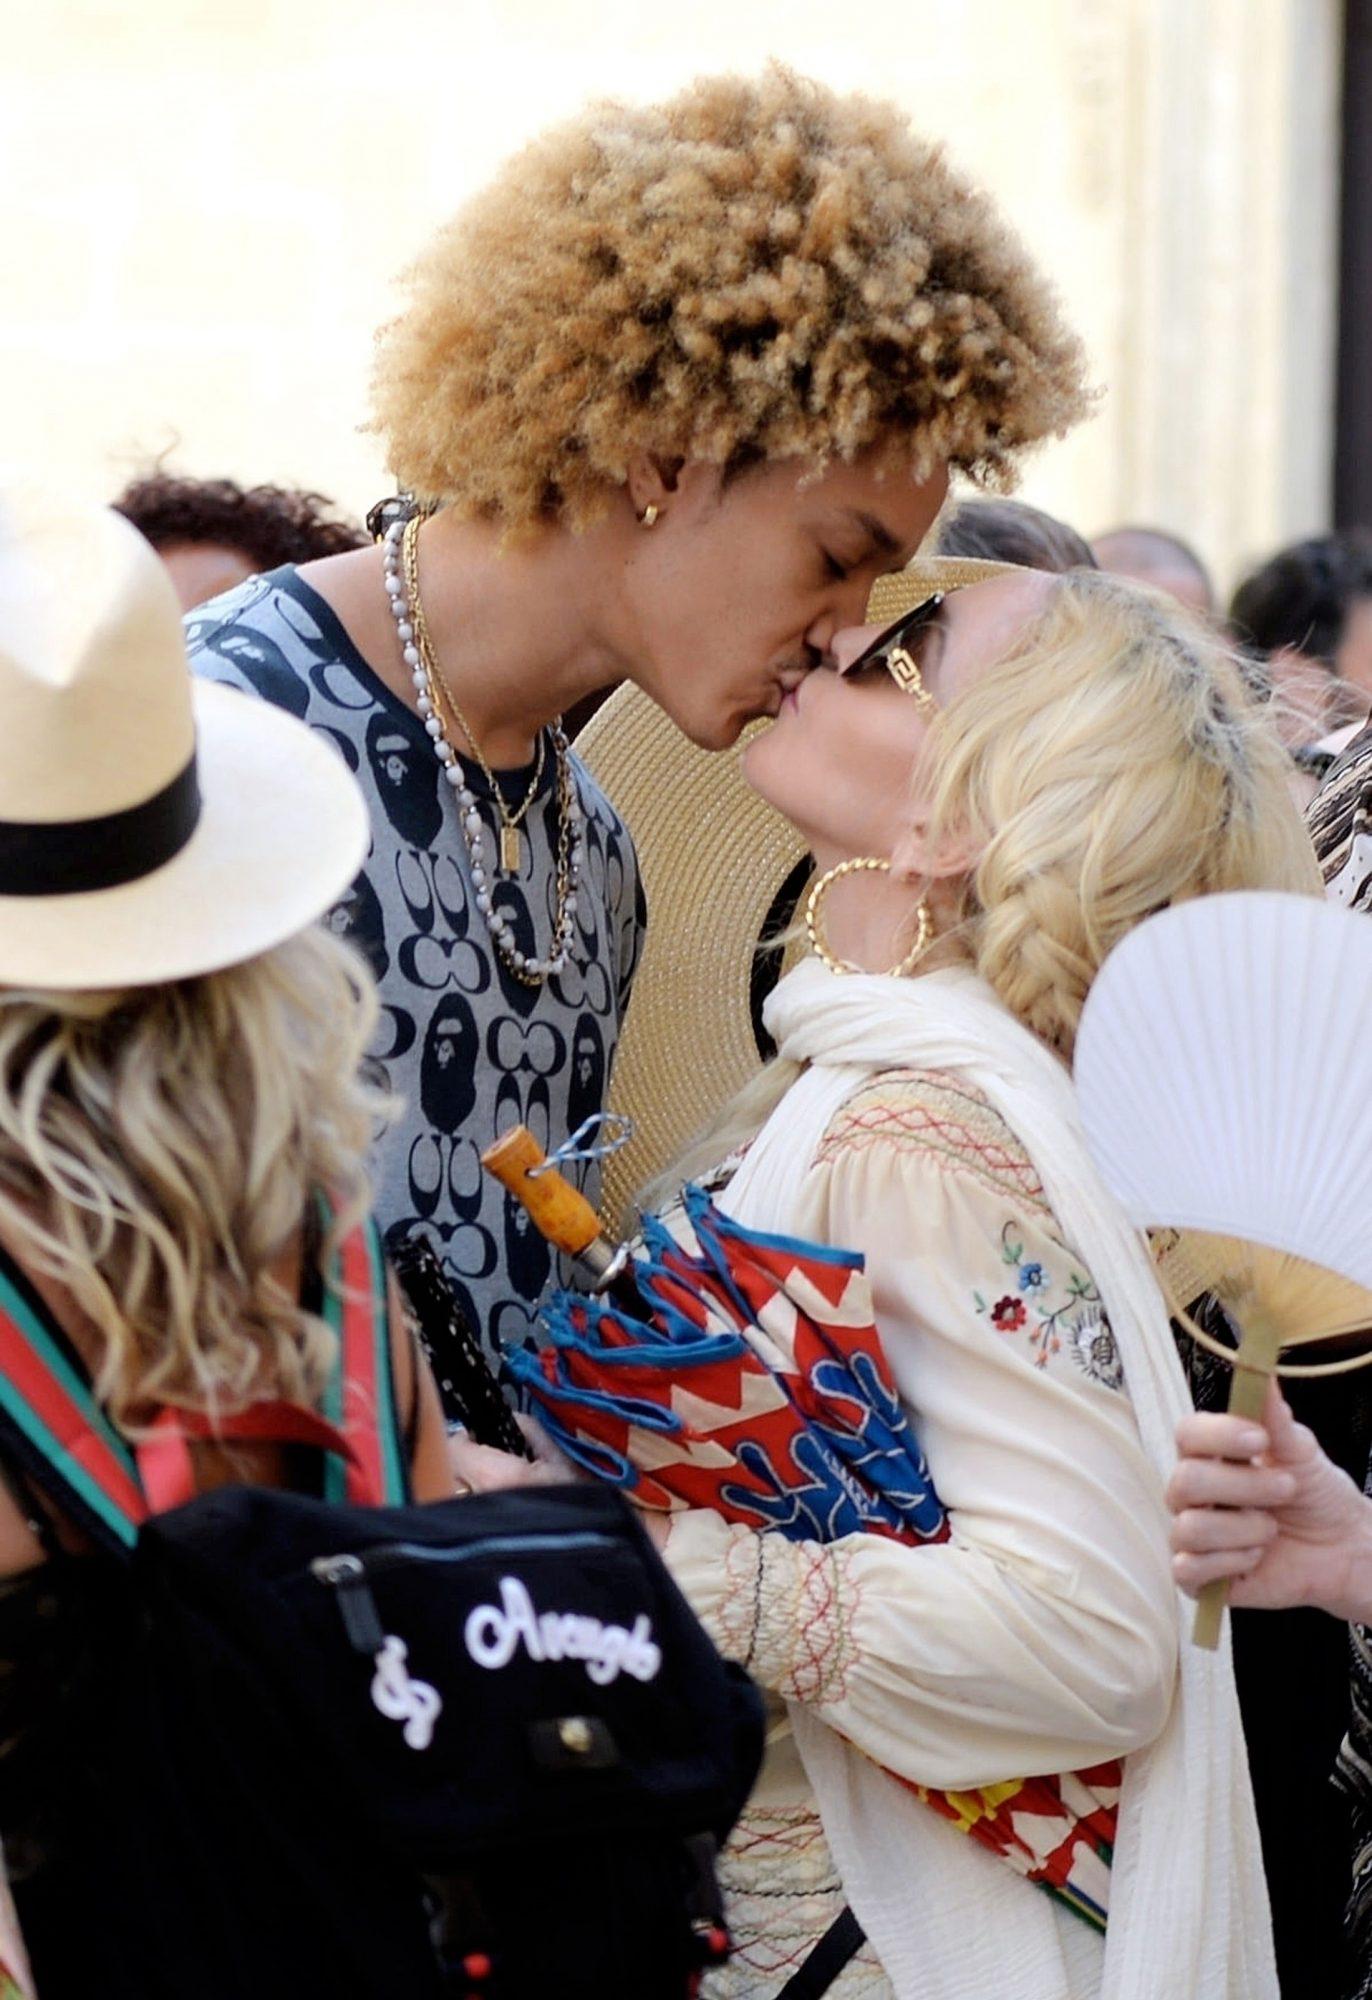 Madonna Shares a Tender Kiss with her Beau Ahlamalik Williams During Italian Birthday Break